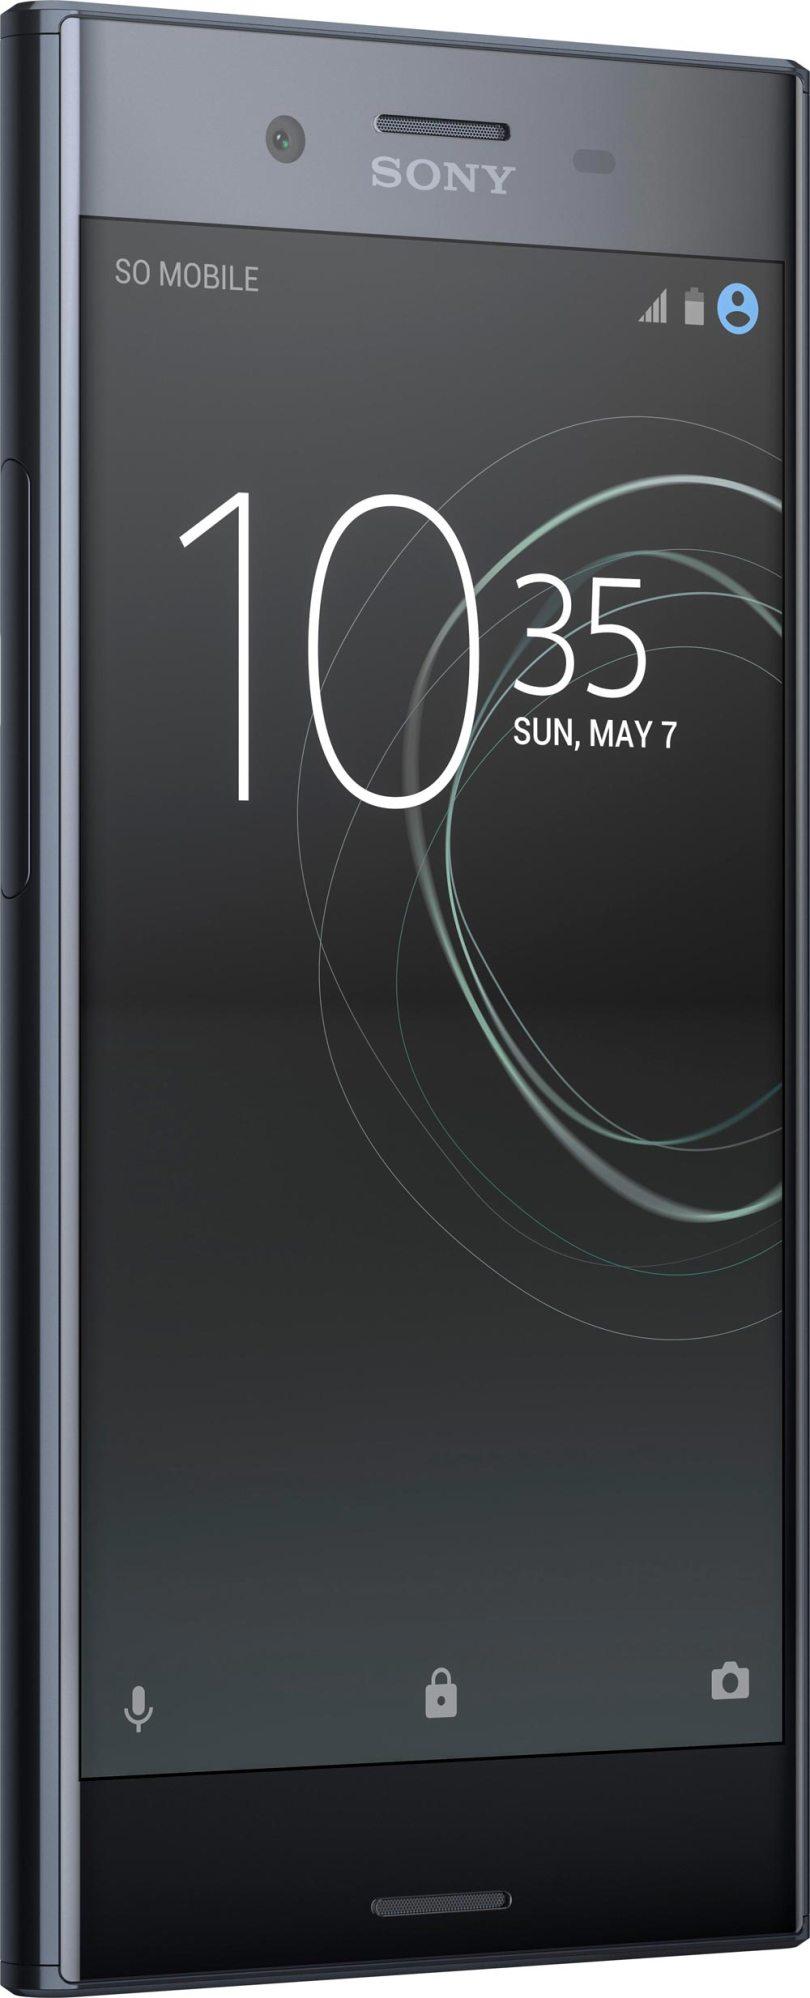 Sony Xperia XZ Premium unlocked smartphone at Best Buy